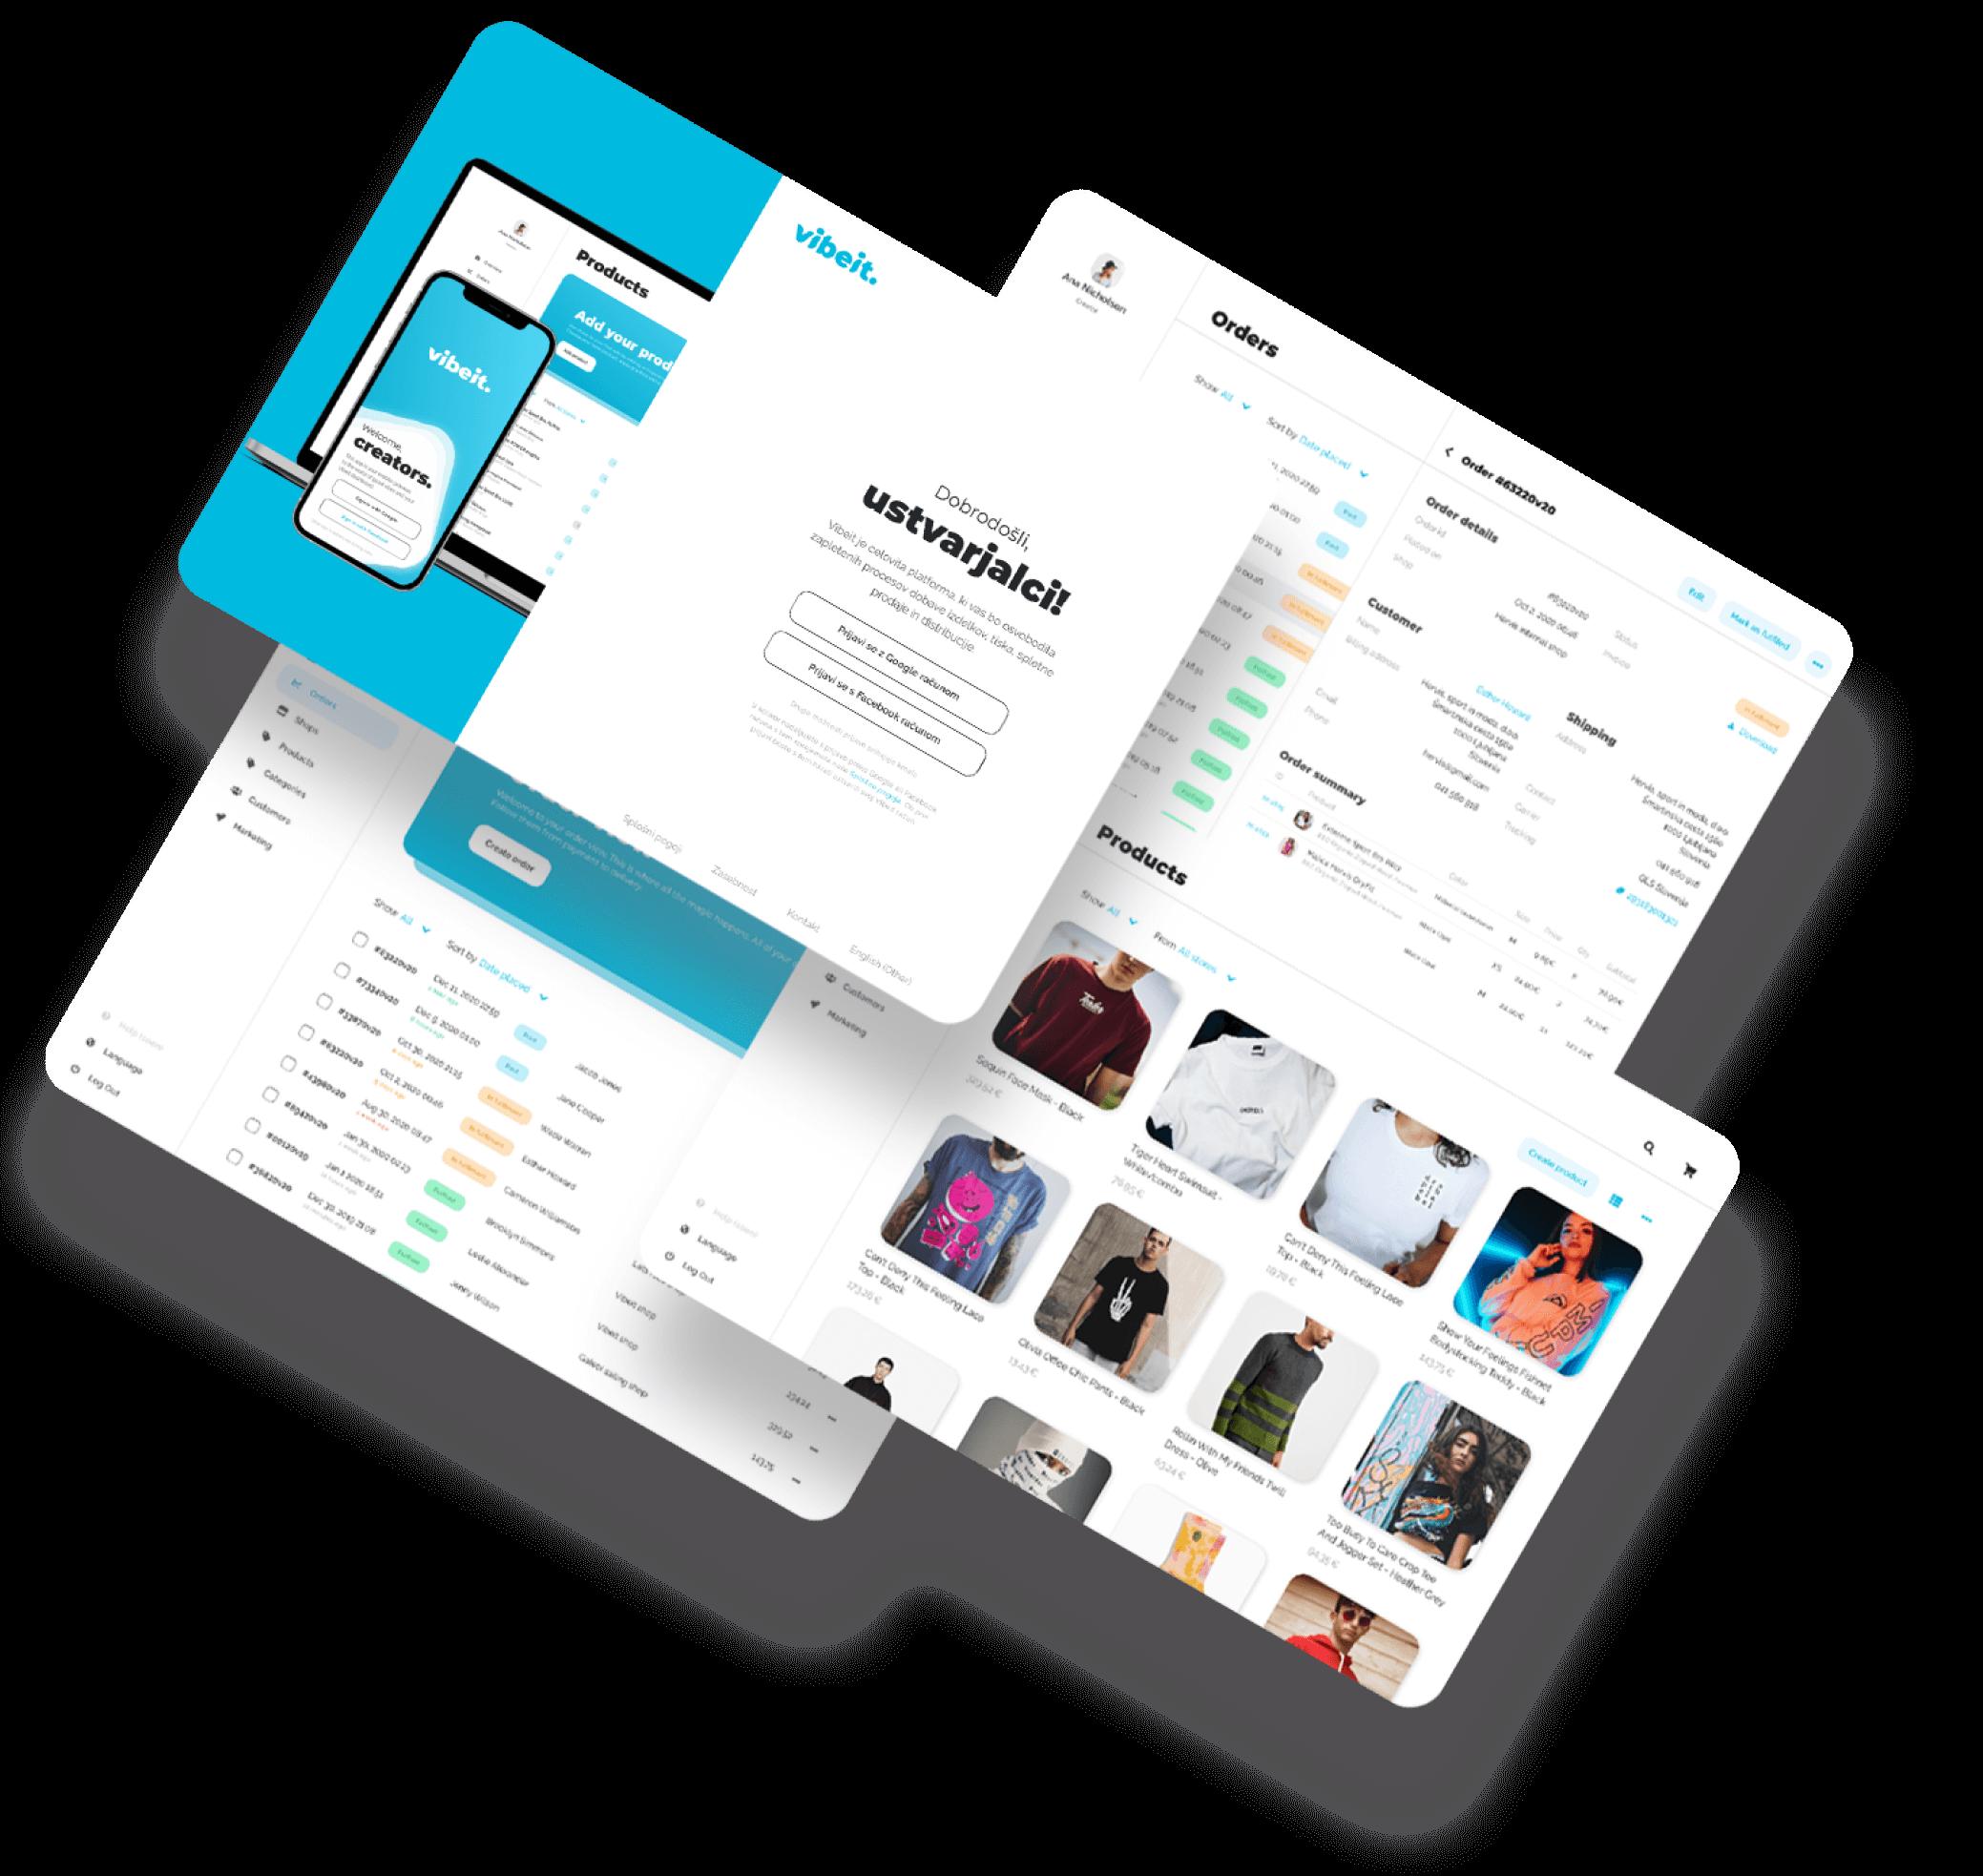 Vibeit banner image, showing 4 overlapping screens from Vibeit merchandising platform, image